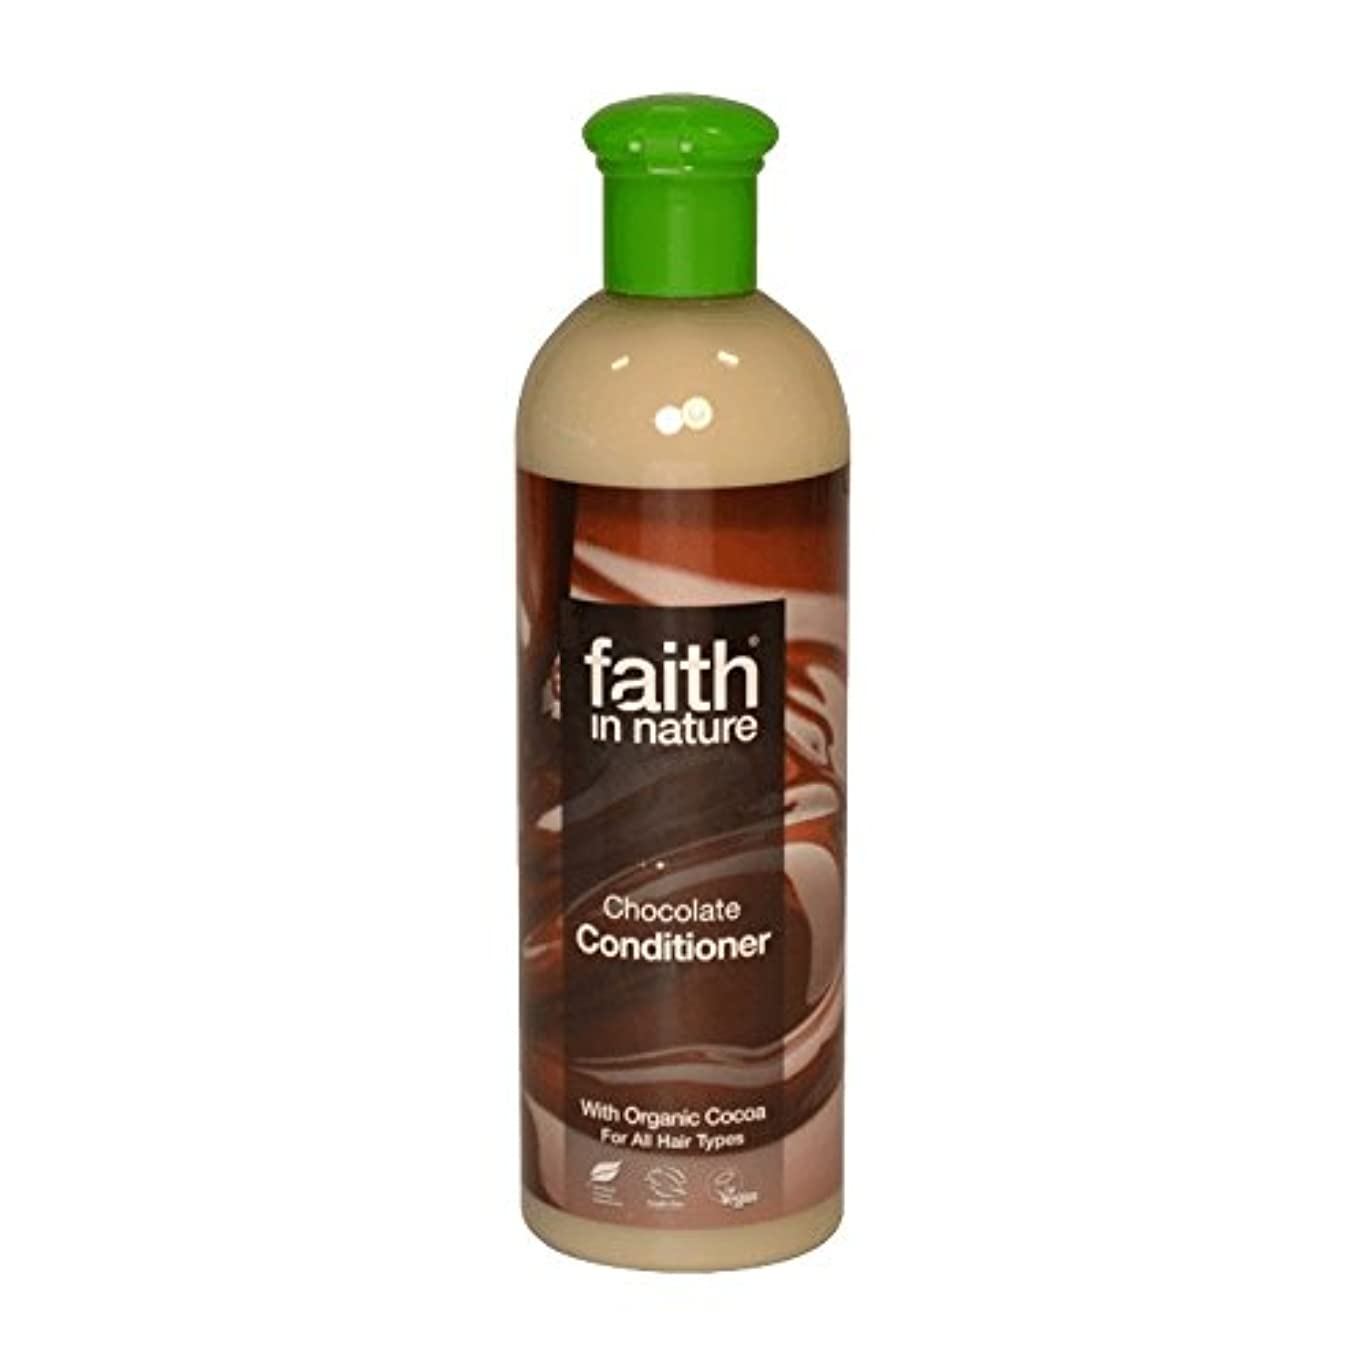 Faith In Nature Chocolate Conditioner 400ml (Pack of 6) - 自然チョコレートコンディショナー400ミリリットルの信仰 (x6) [並行輸入品]